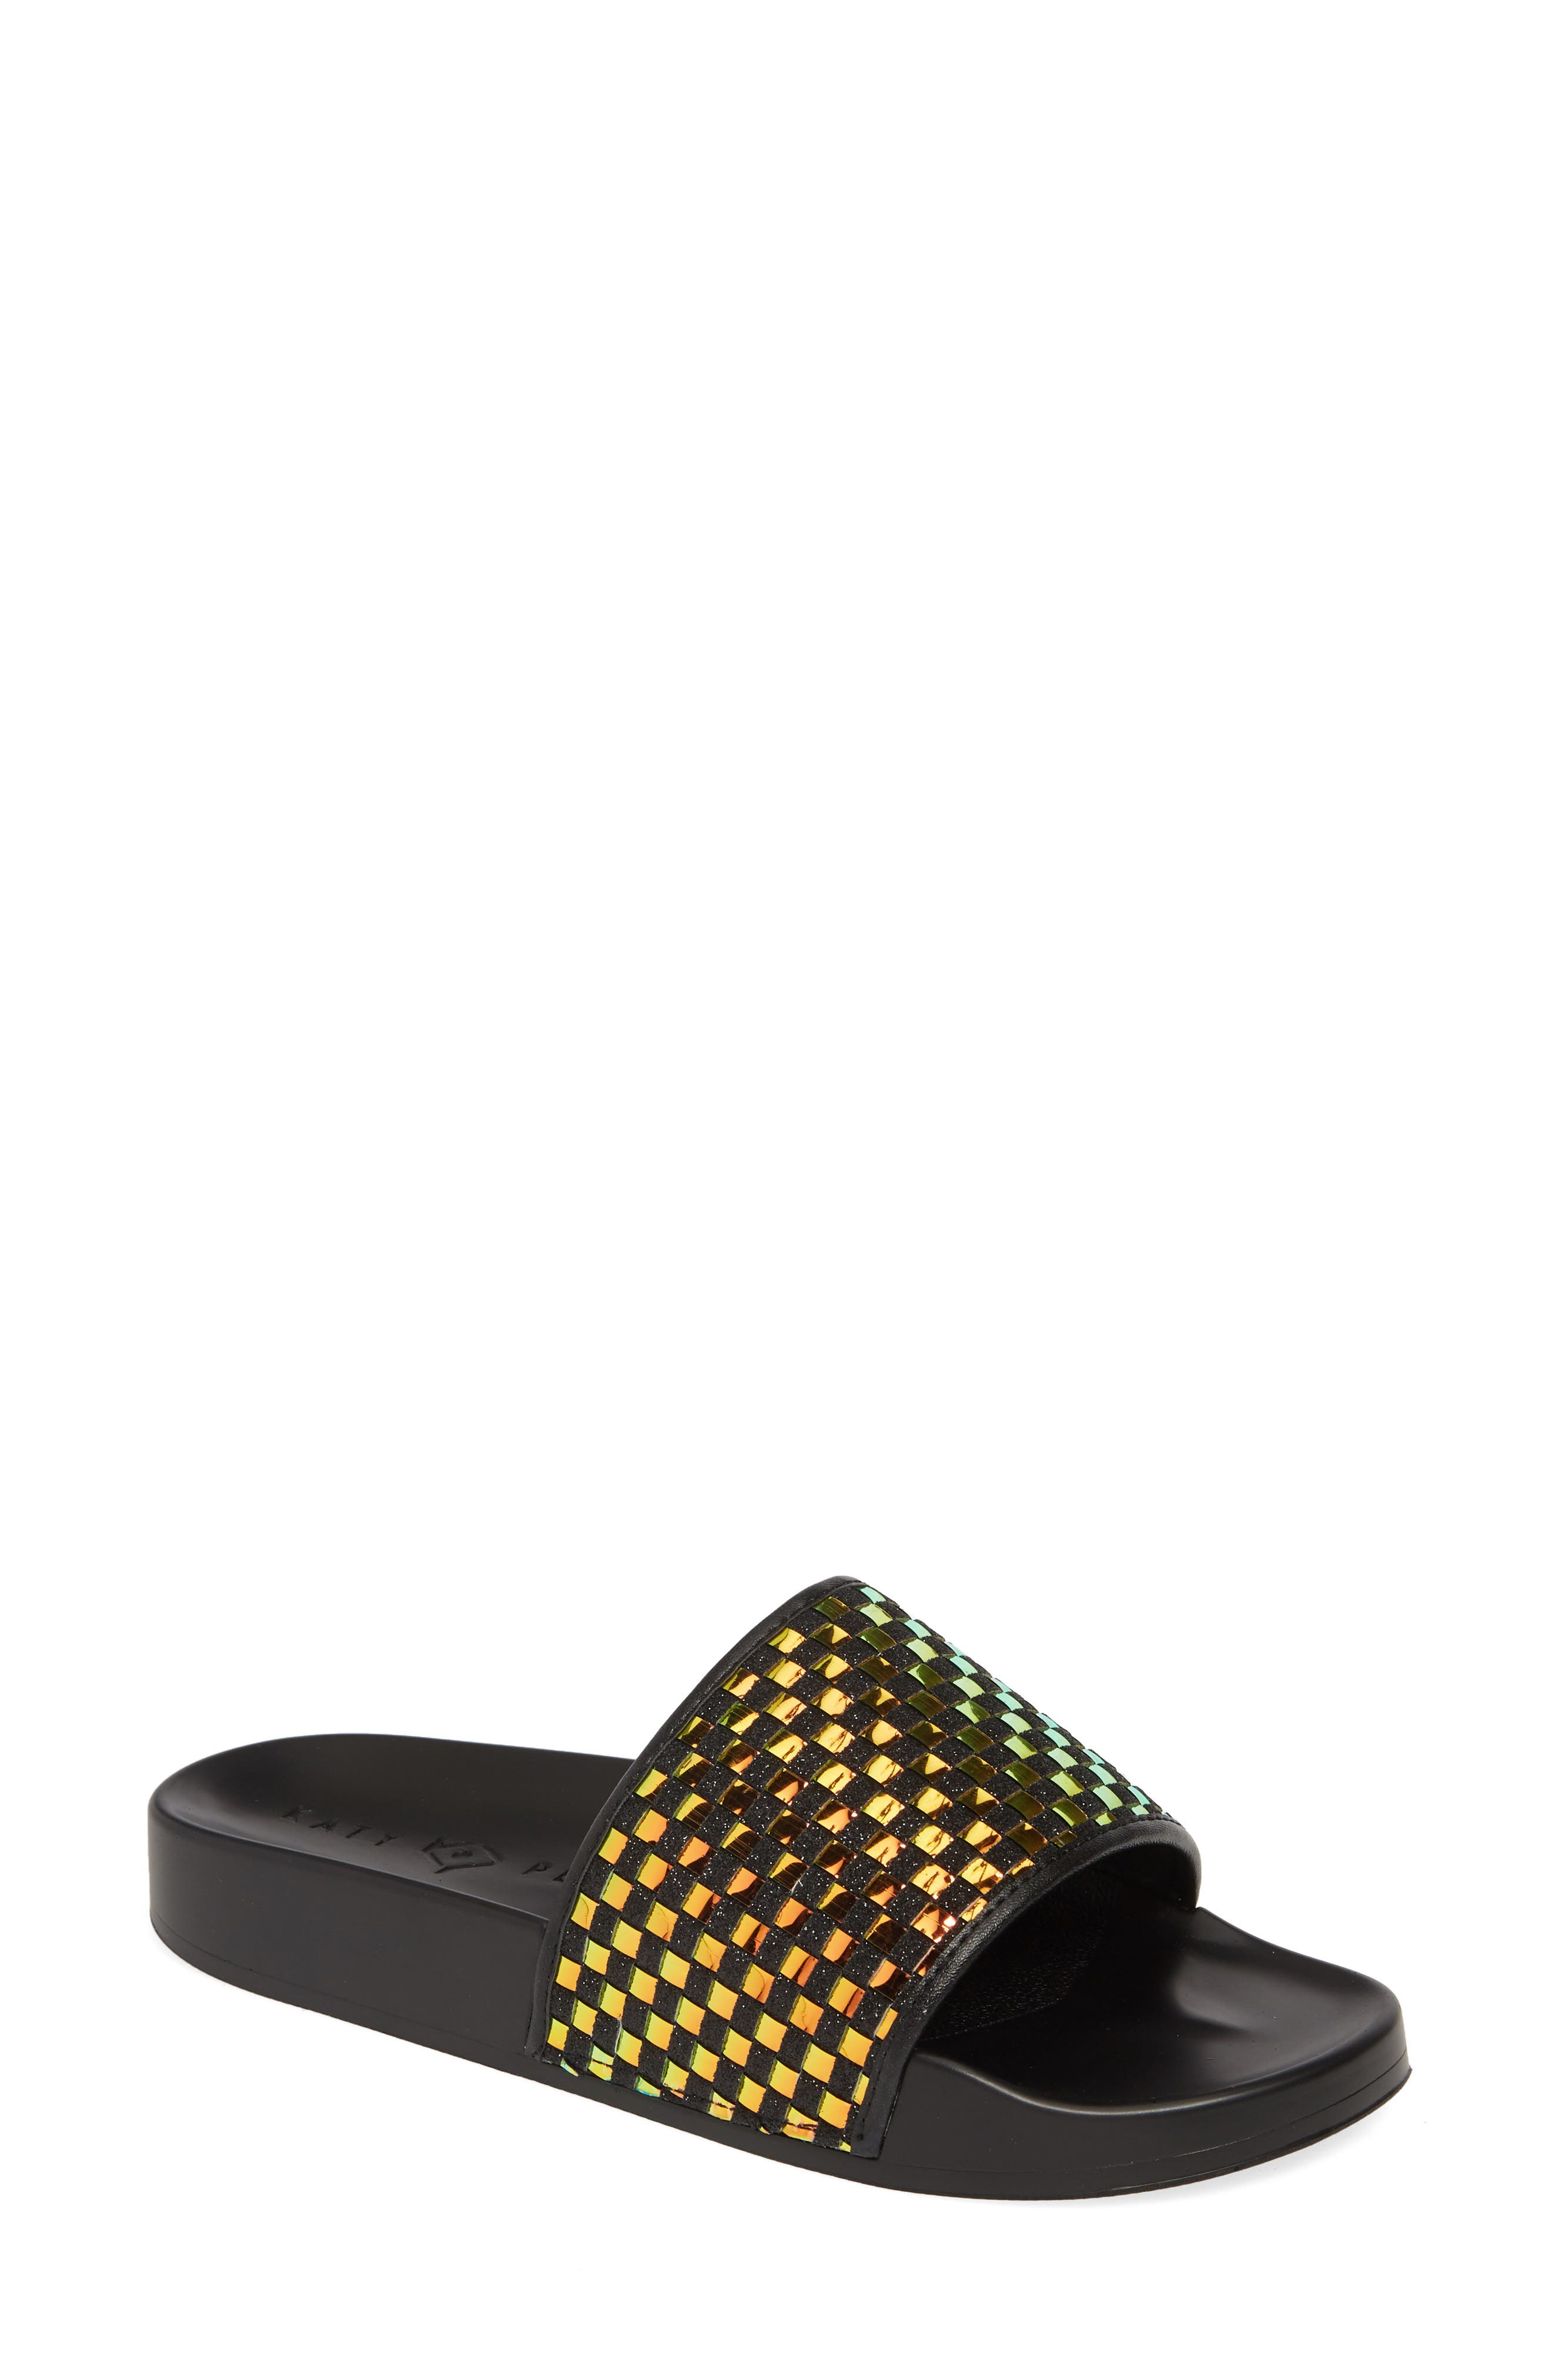 women's katy perry the jimmi slide sandal, size 10 m - black